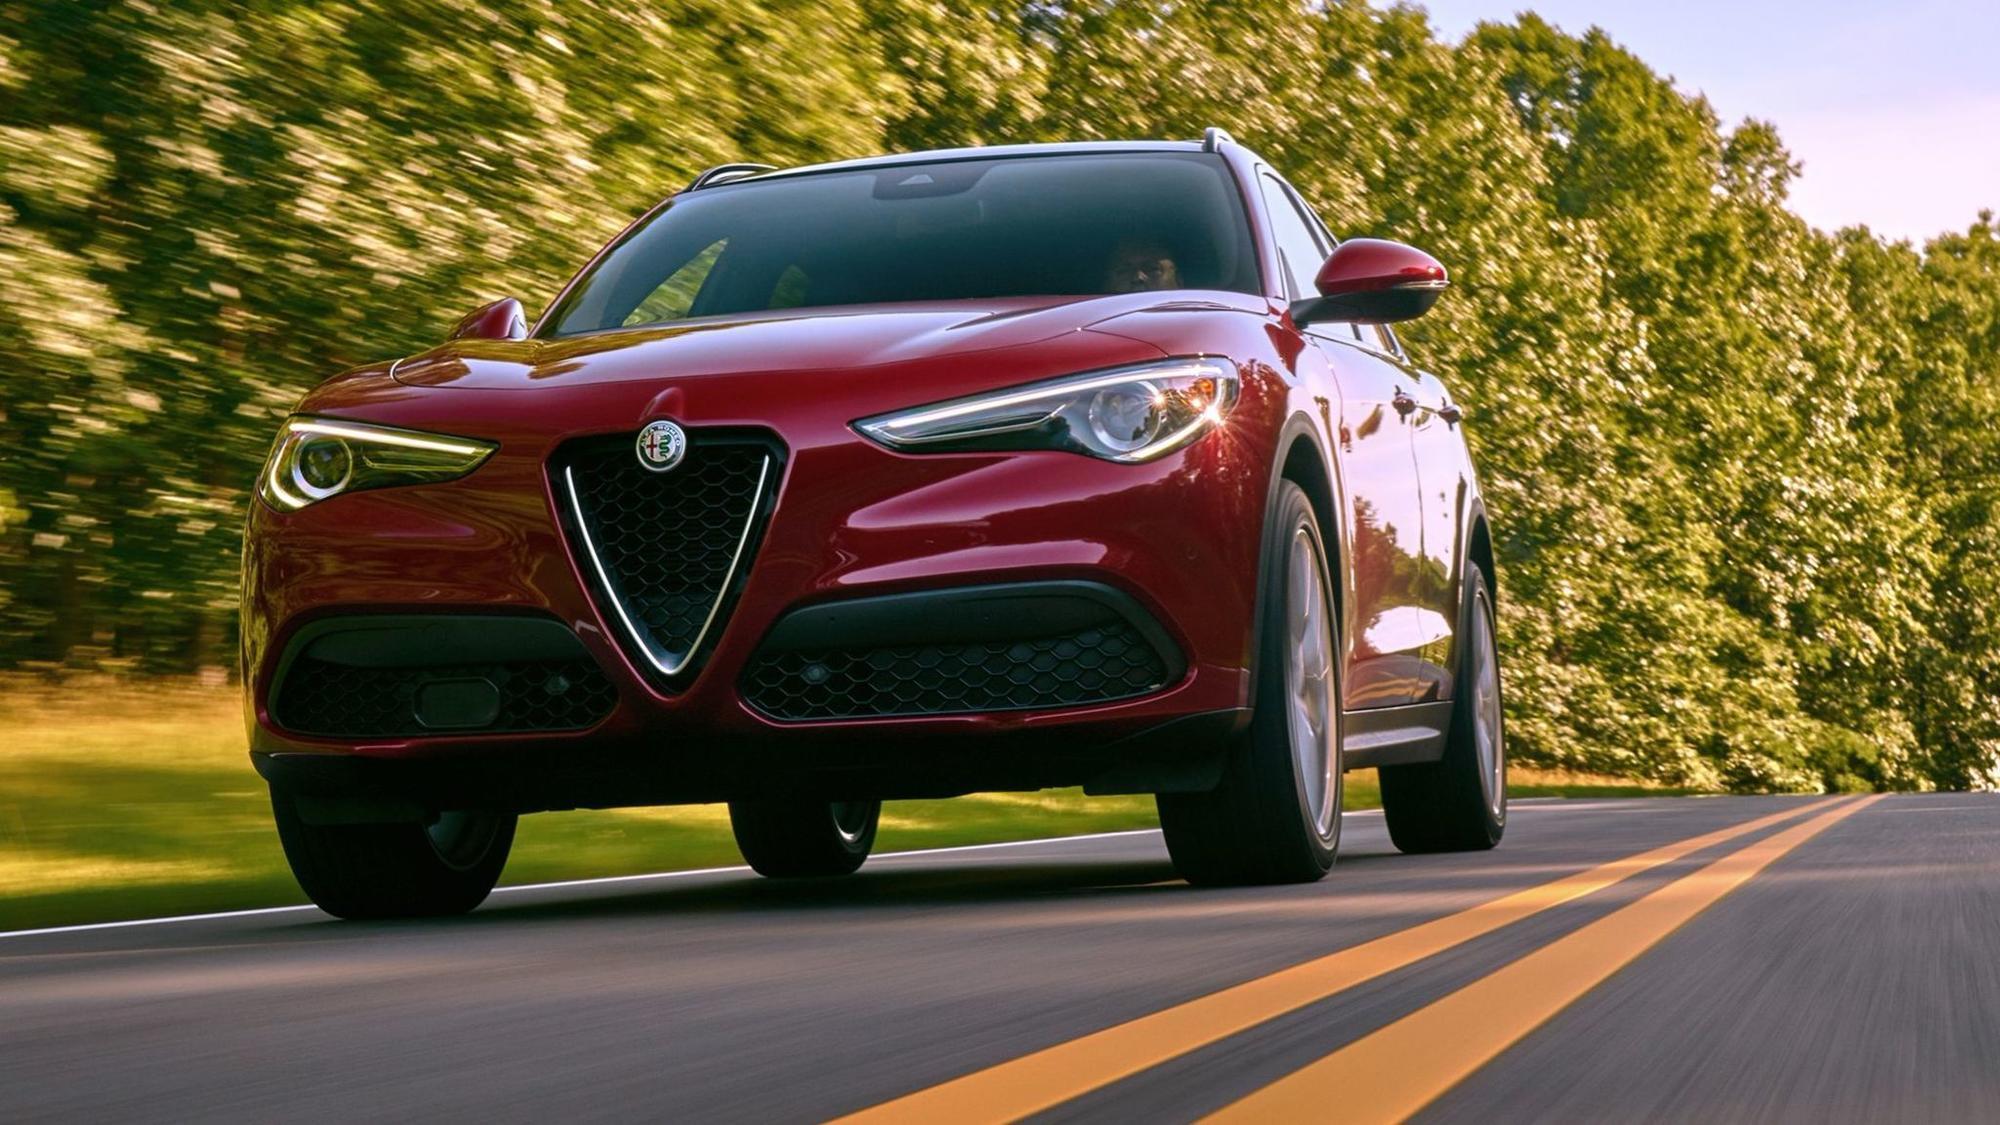 2018 Alfa Romeo Stelvio An Italian Job For The Family The San